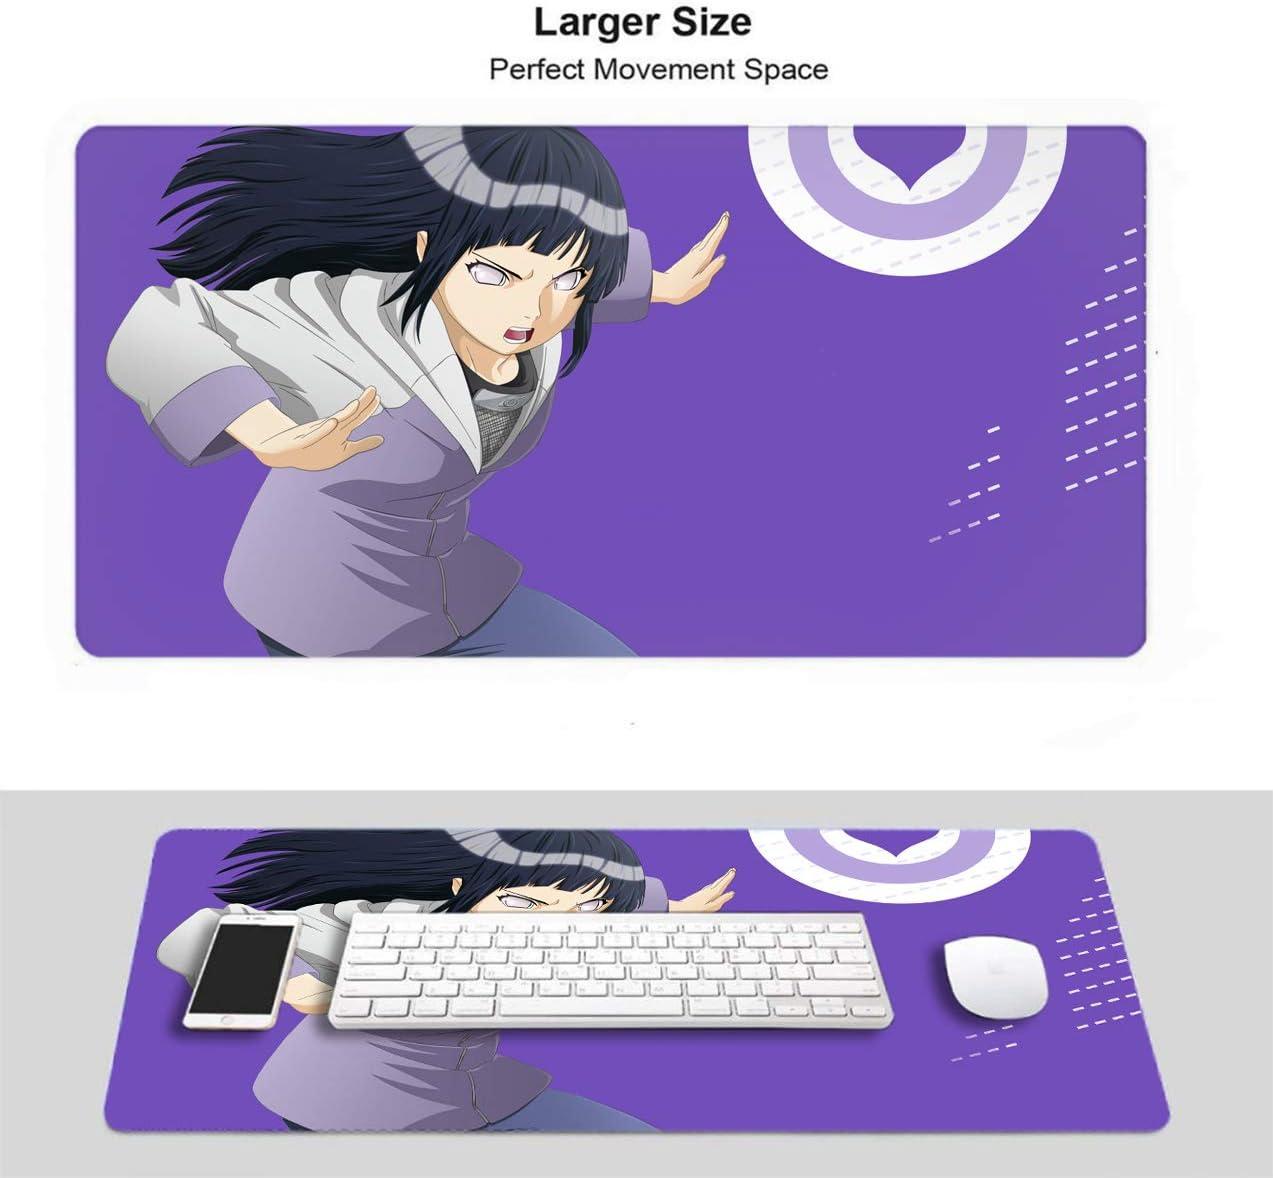 Large Gaming Mouse Pad Computer Keyboard Mouse Mat for Uzumaki Naruto Sasuke Custom Design Waterproof Non-Slip Rubber Anti Slip Rubber Base-11.8x31.5x0.2 in